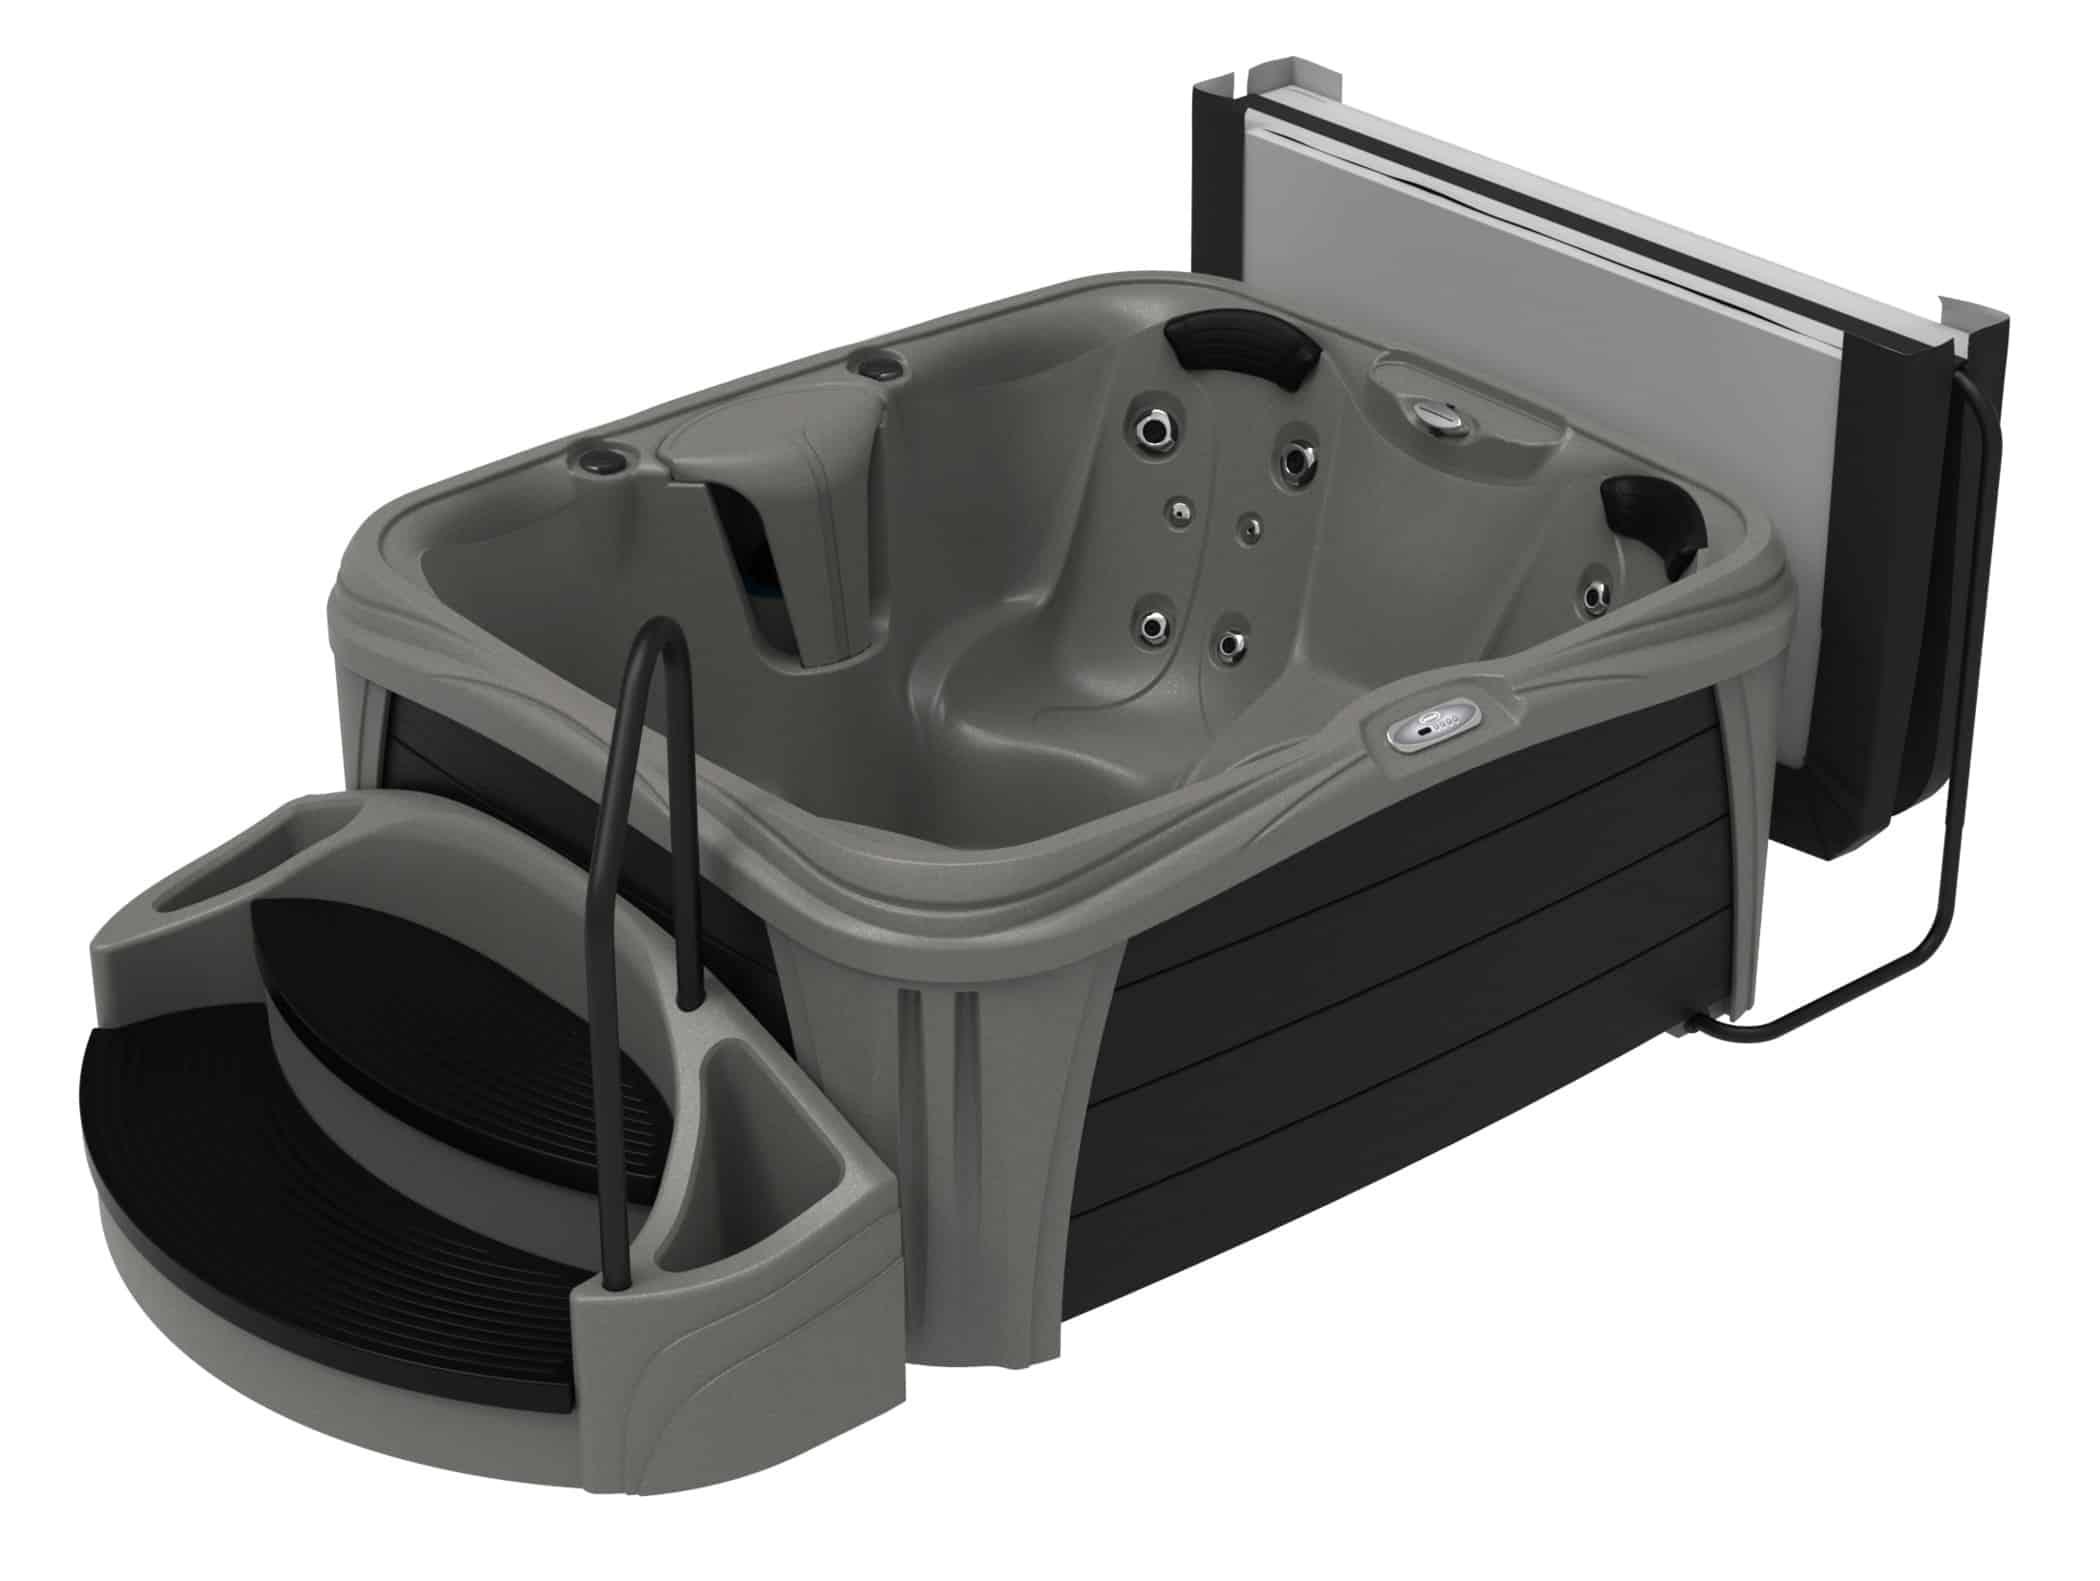 jacuzzi play series hot tub